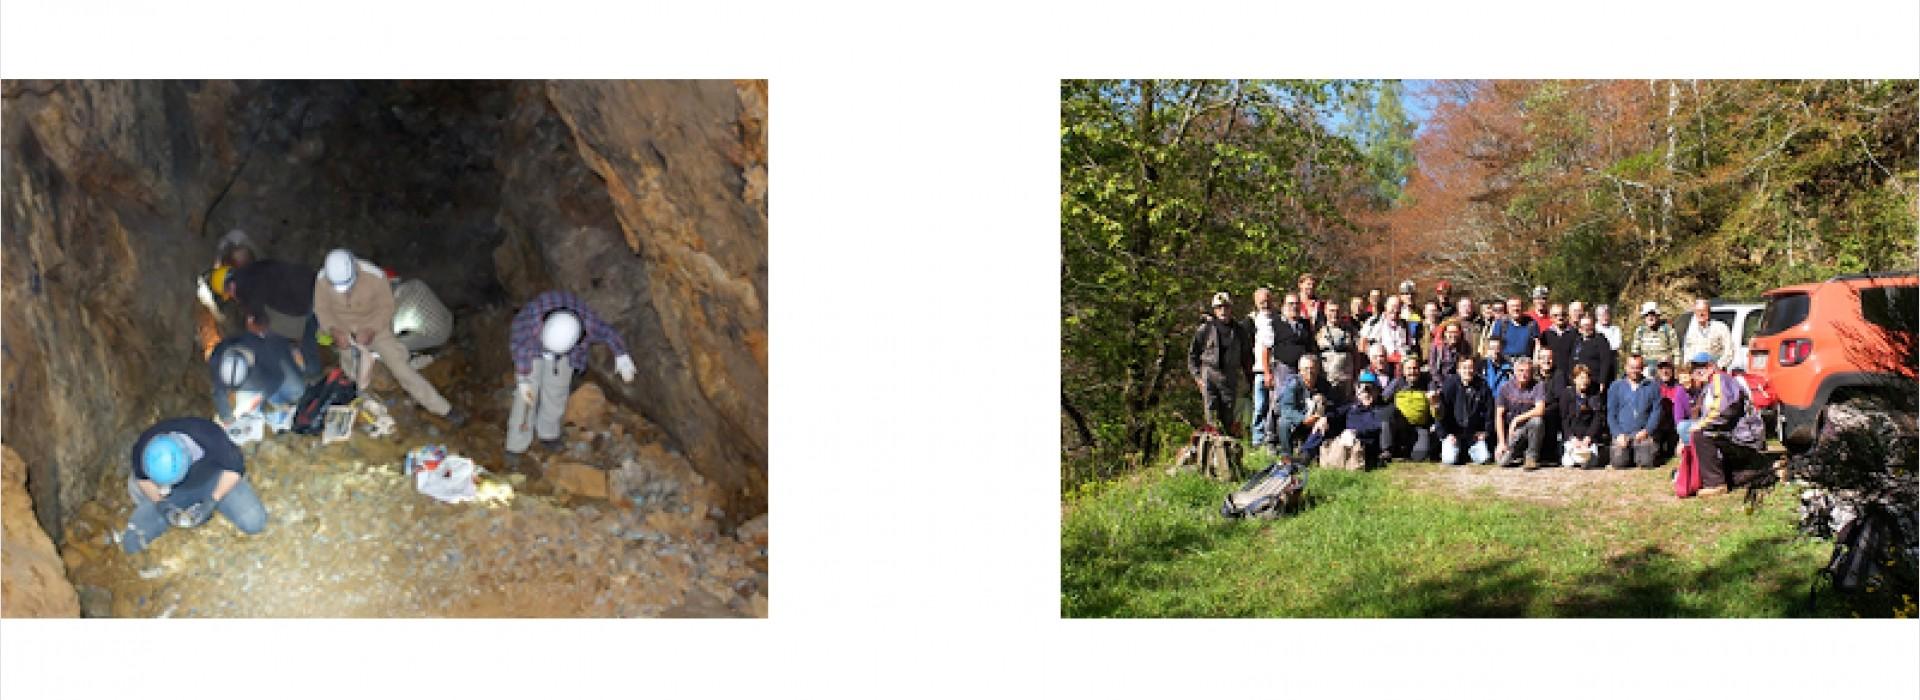 >>POSPUESTA<< 4a Trobada de Micromineralogia  i Sistemàtica Mineral  en Camprodon – Rocabruna,  Ripollès, Girona, Catalunya